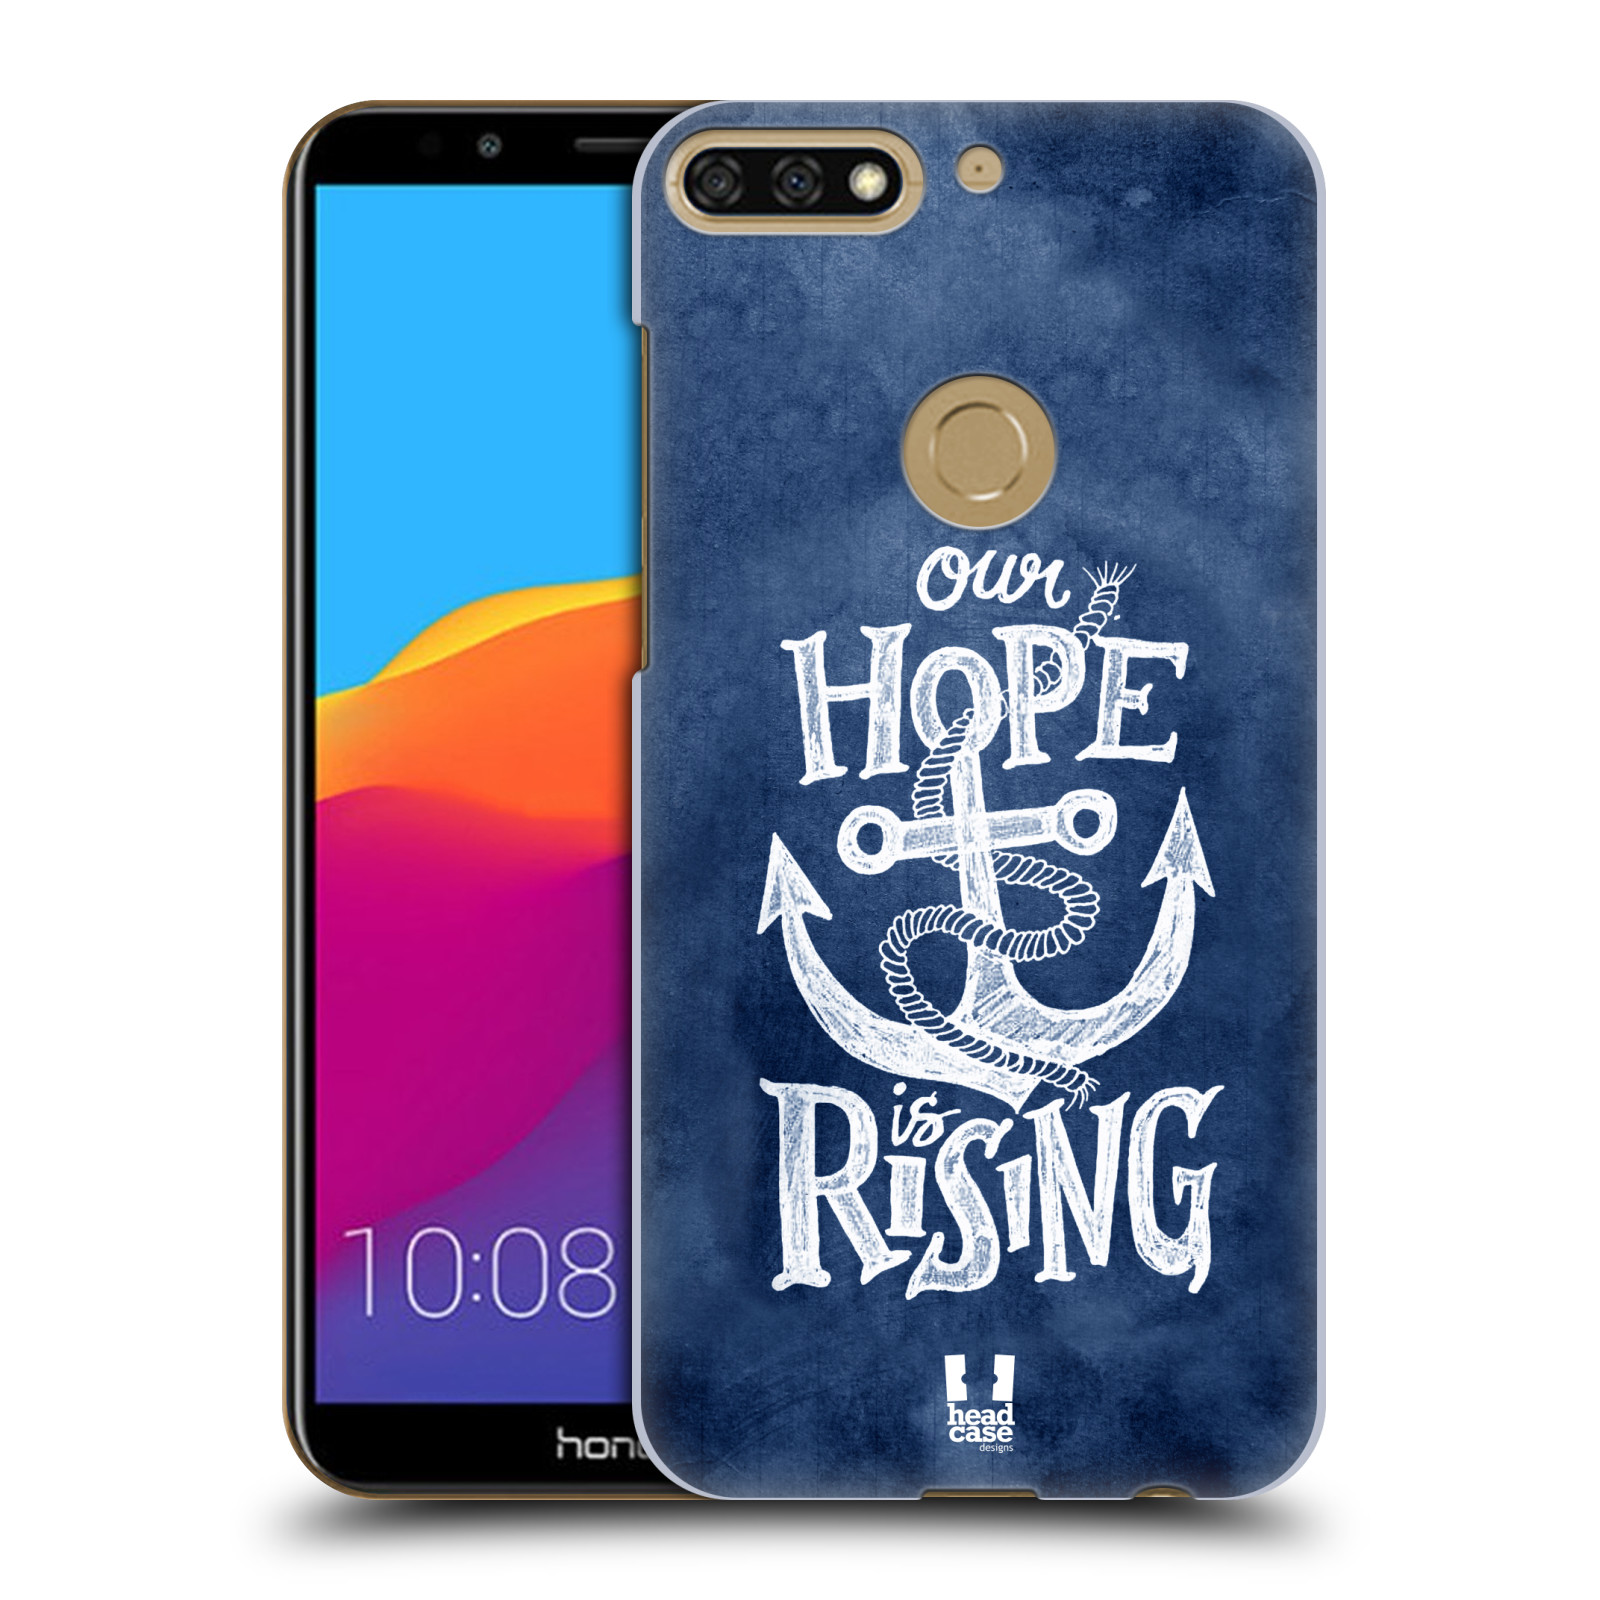 Plastové pouzdro na mobil Huawei Y7 Prime 2018 - Head Case - KOTVA RISING